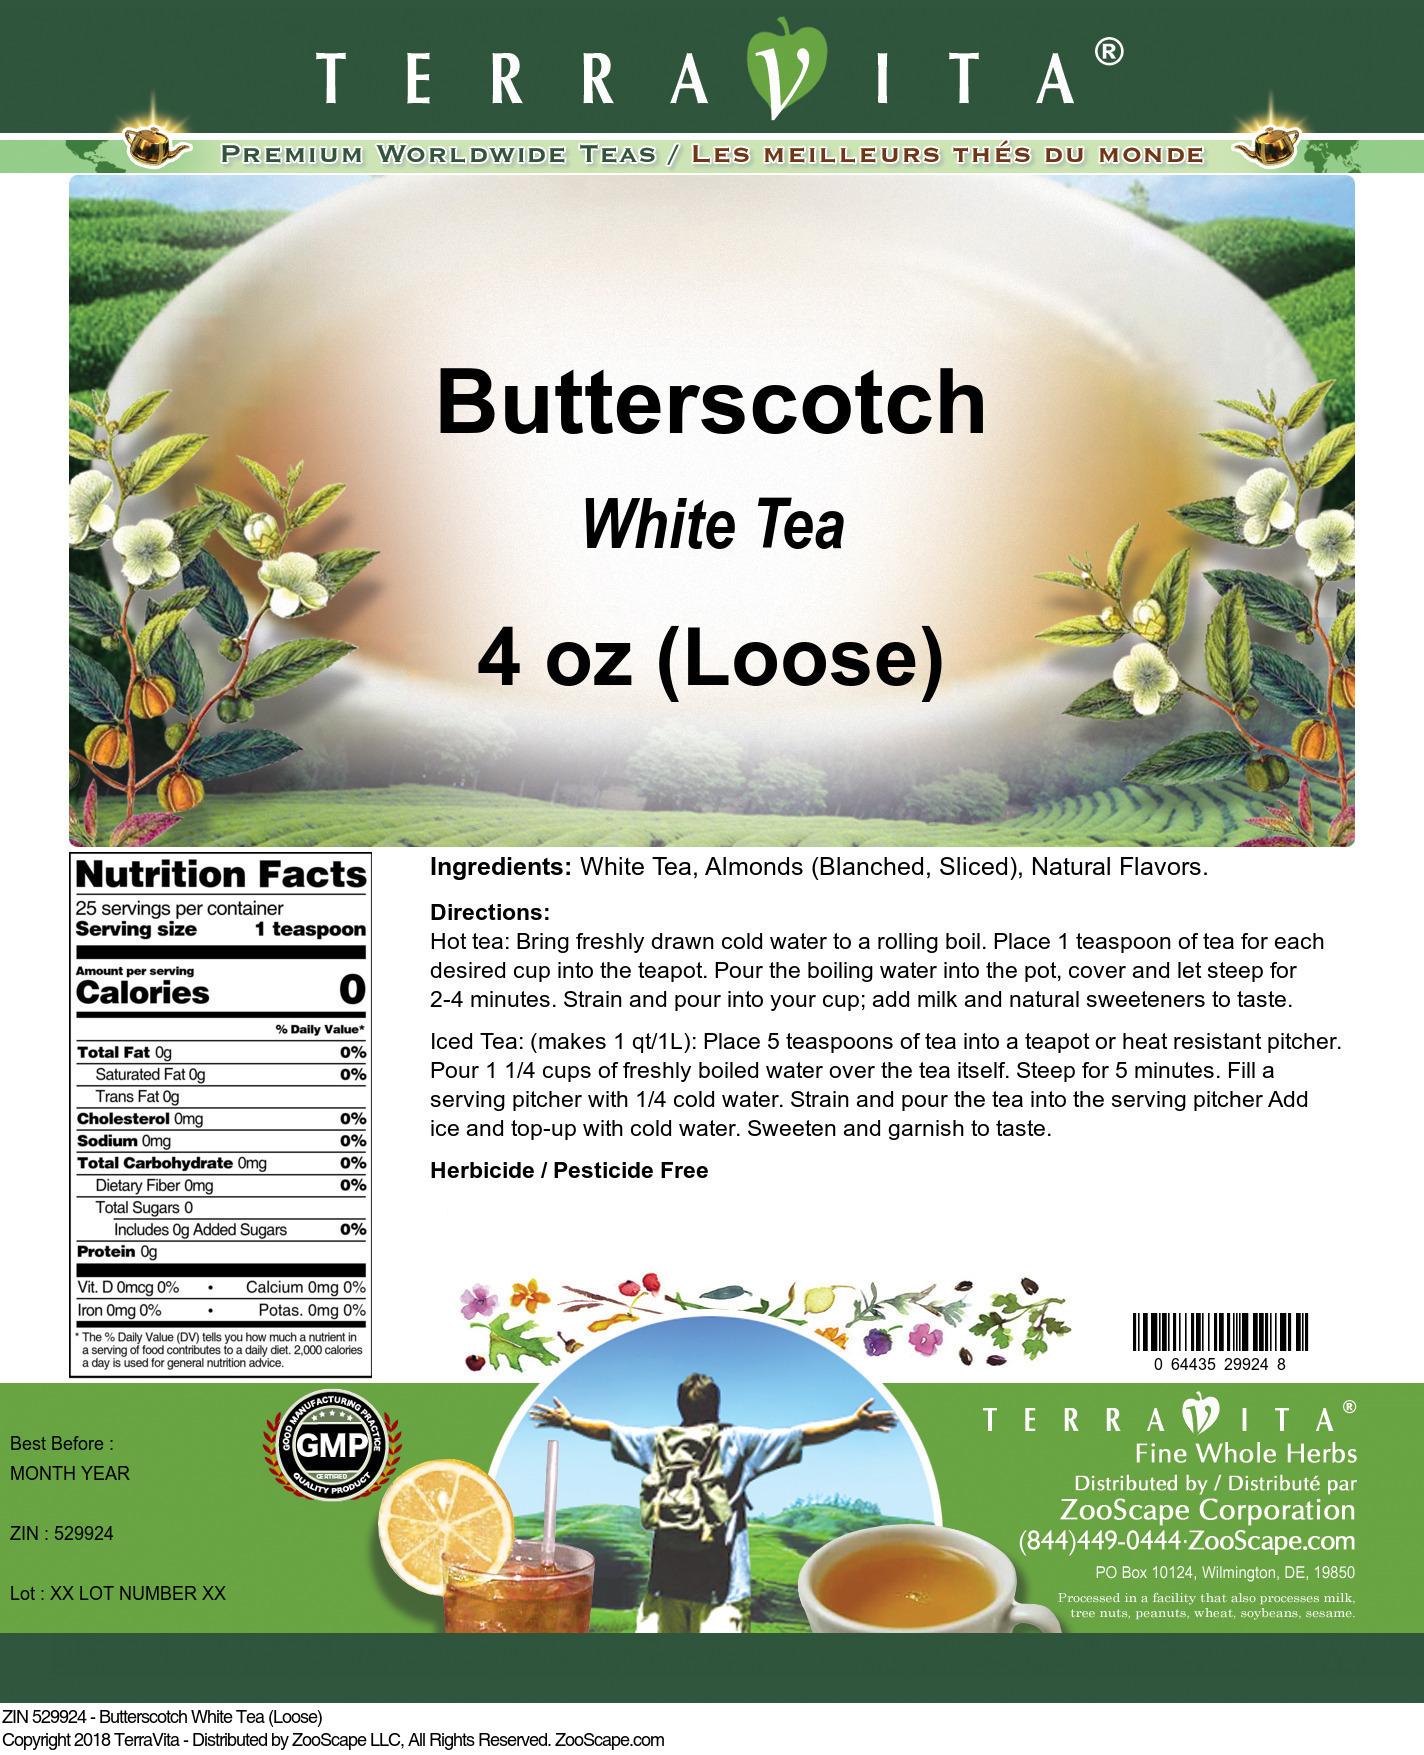 Butterscotch White Tea